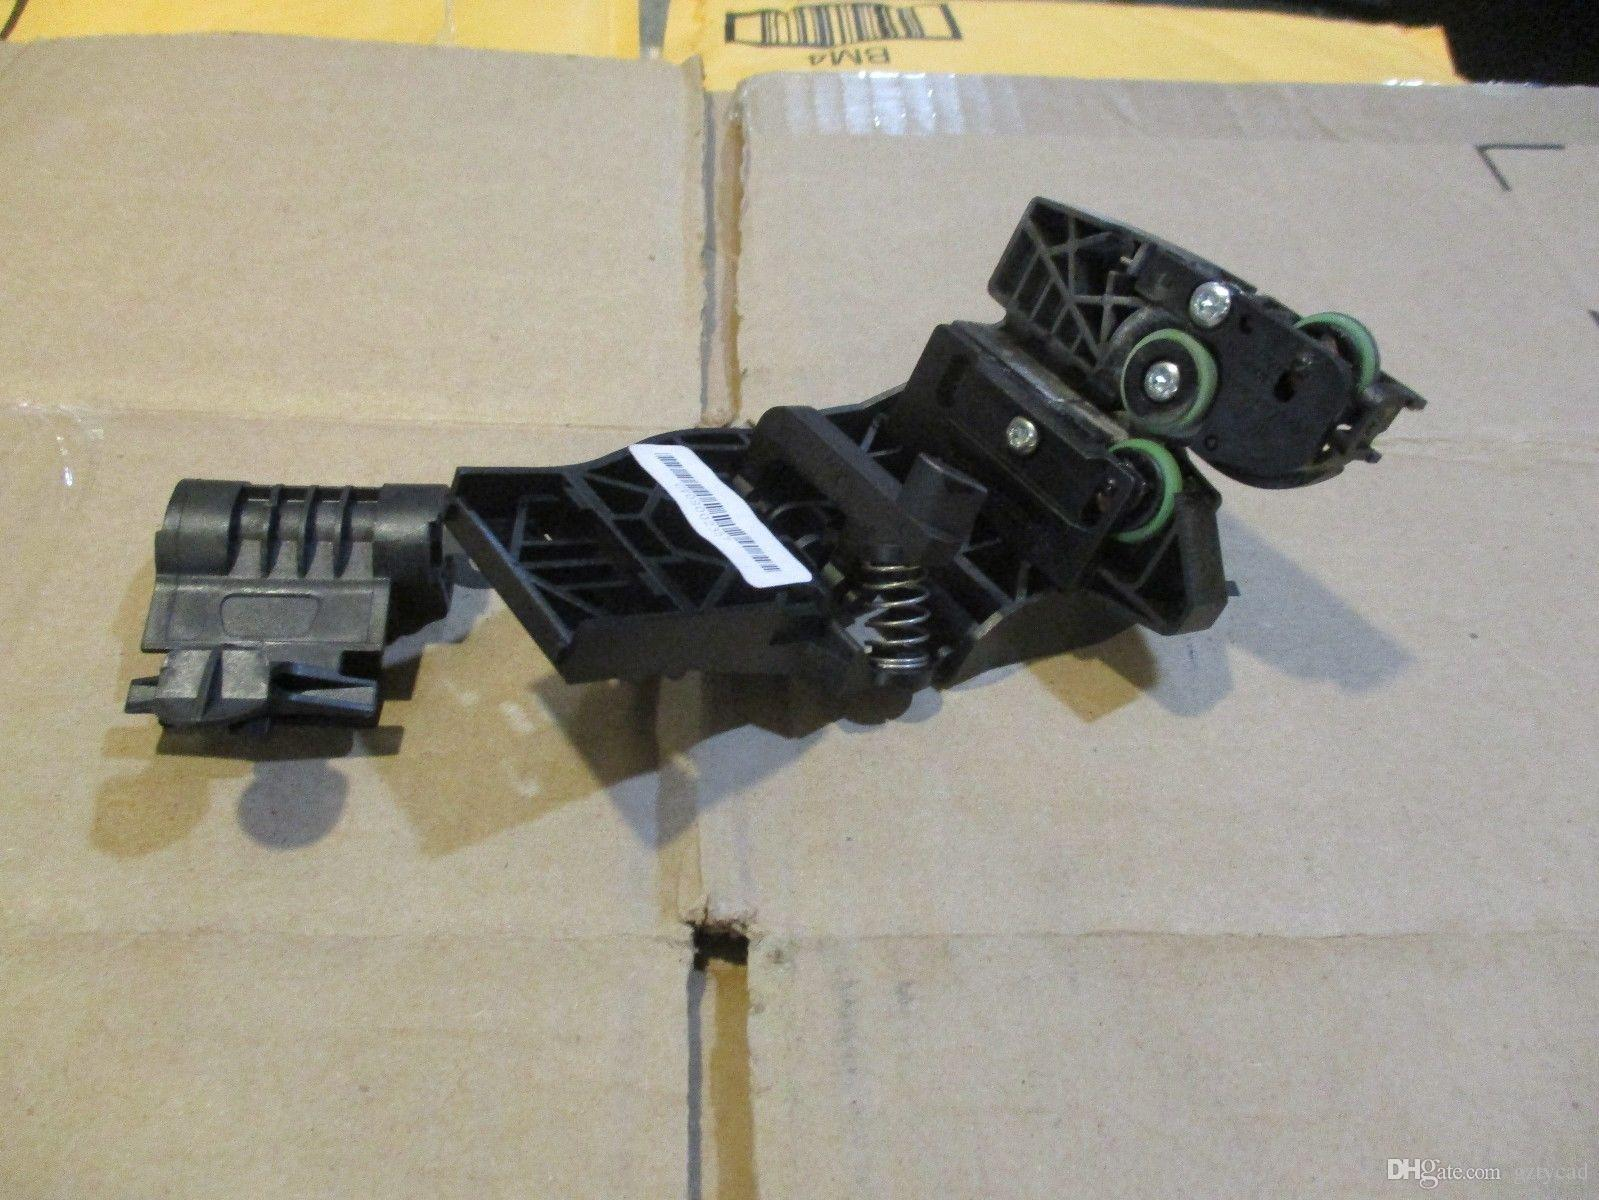 Hp Designjet 500 Plotter Spare Parts | Newmotorjdi co